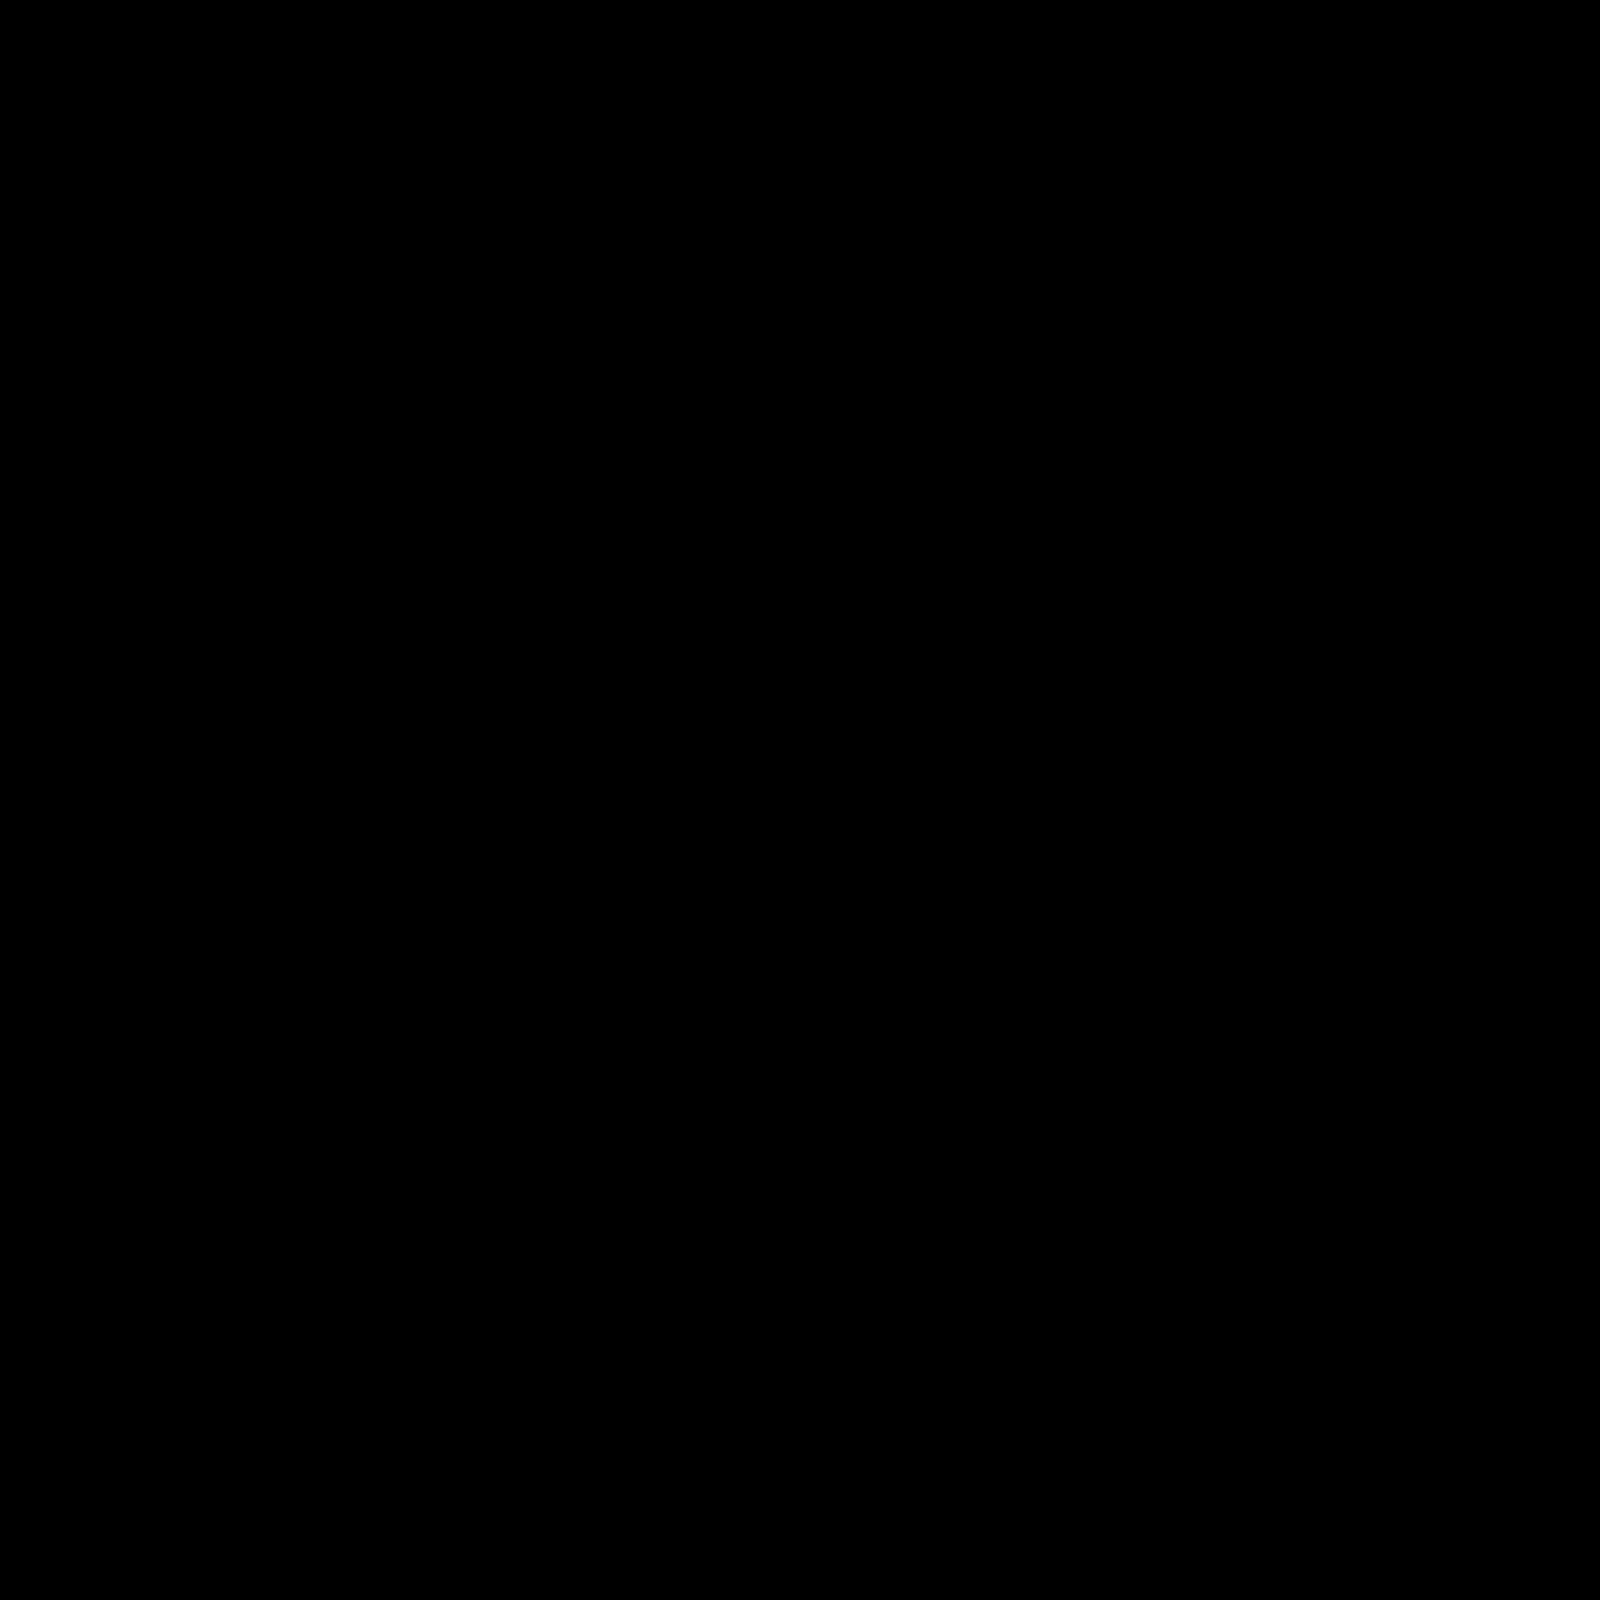 1600x1600 Unchecked Checkbox Icon